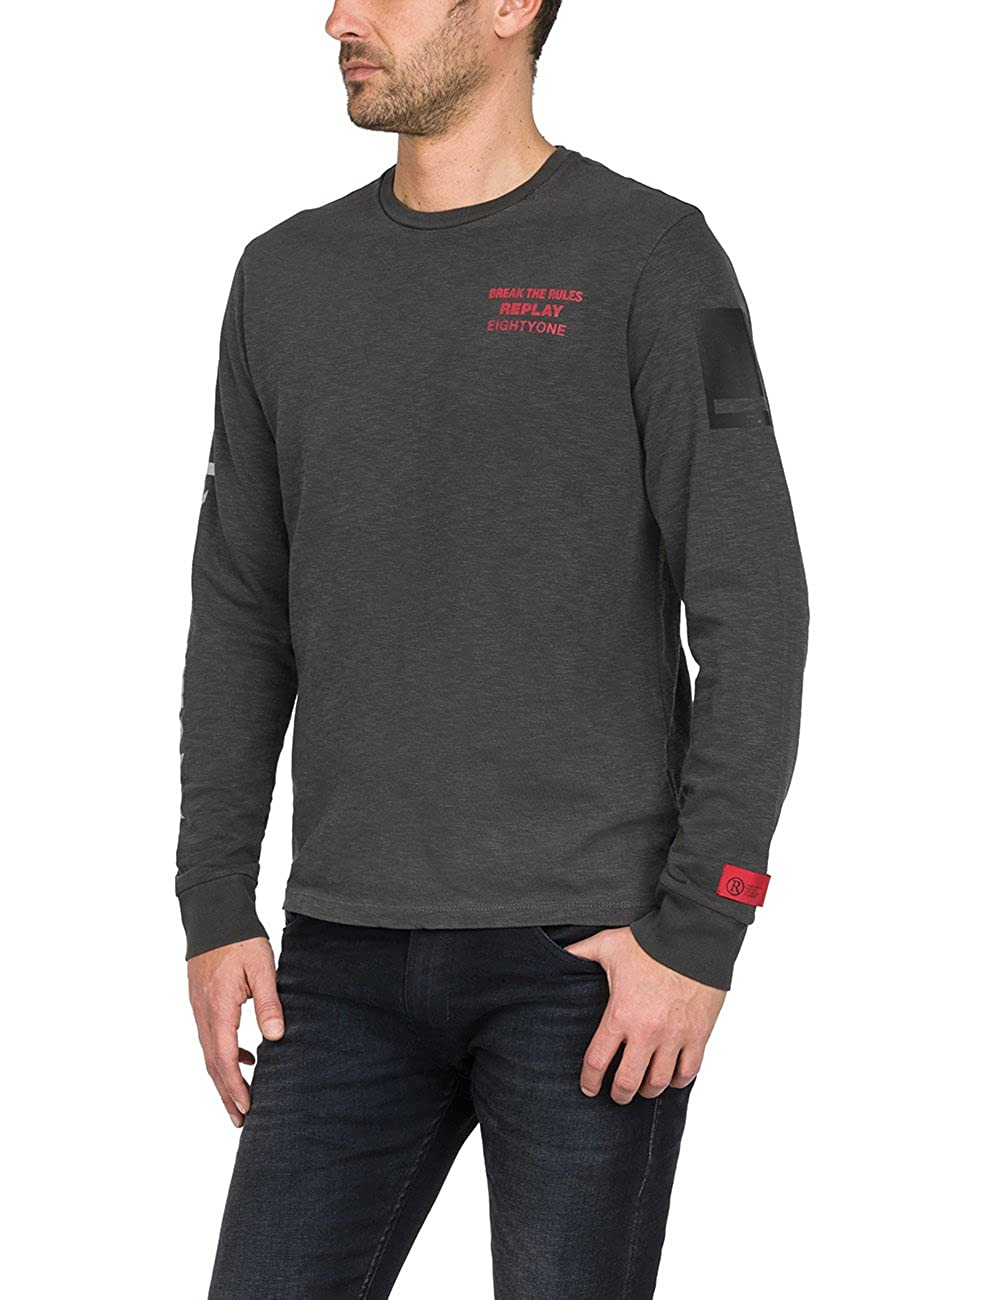 REPLAY M3635 .000.22586g - Camisa Manga Larga Hombre